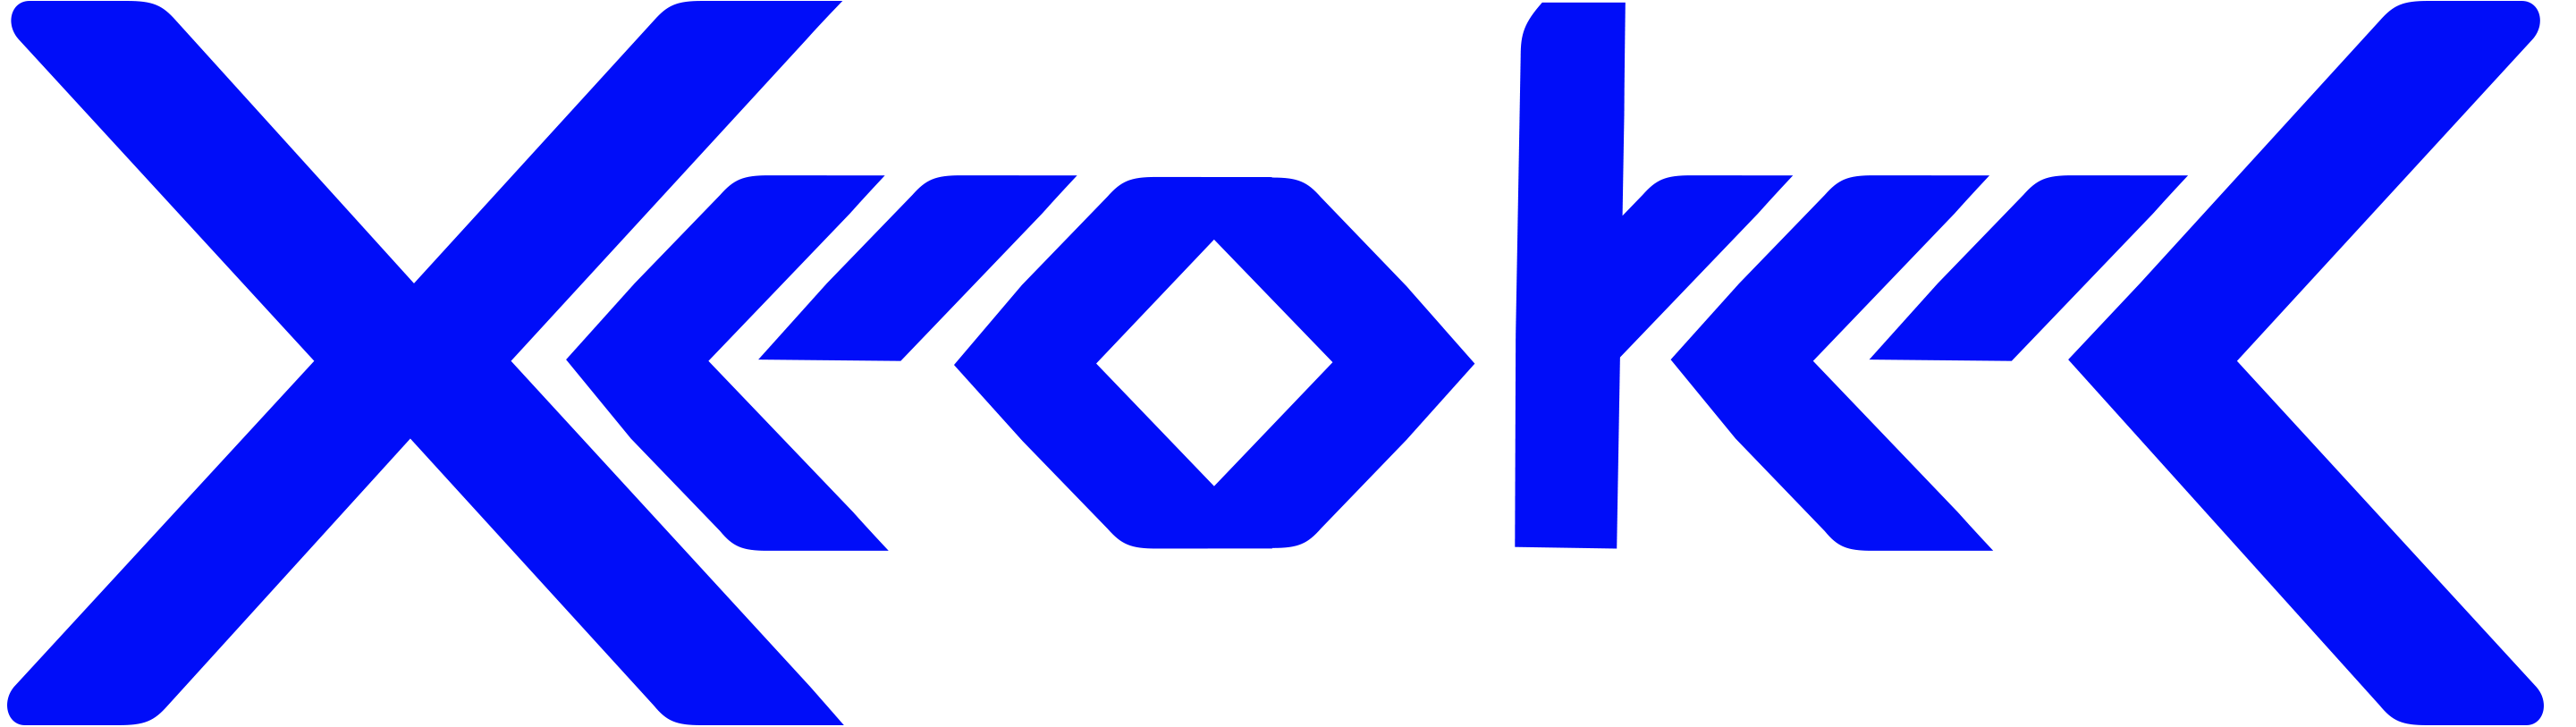 Xeotek